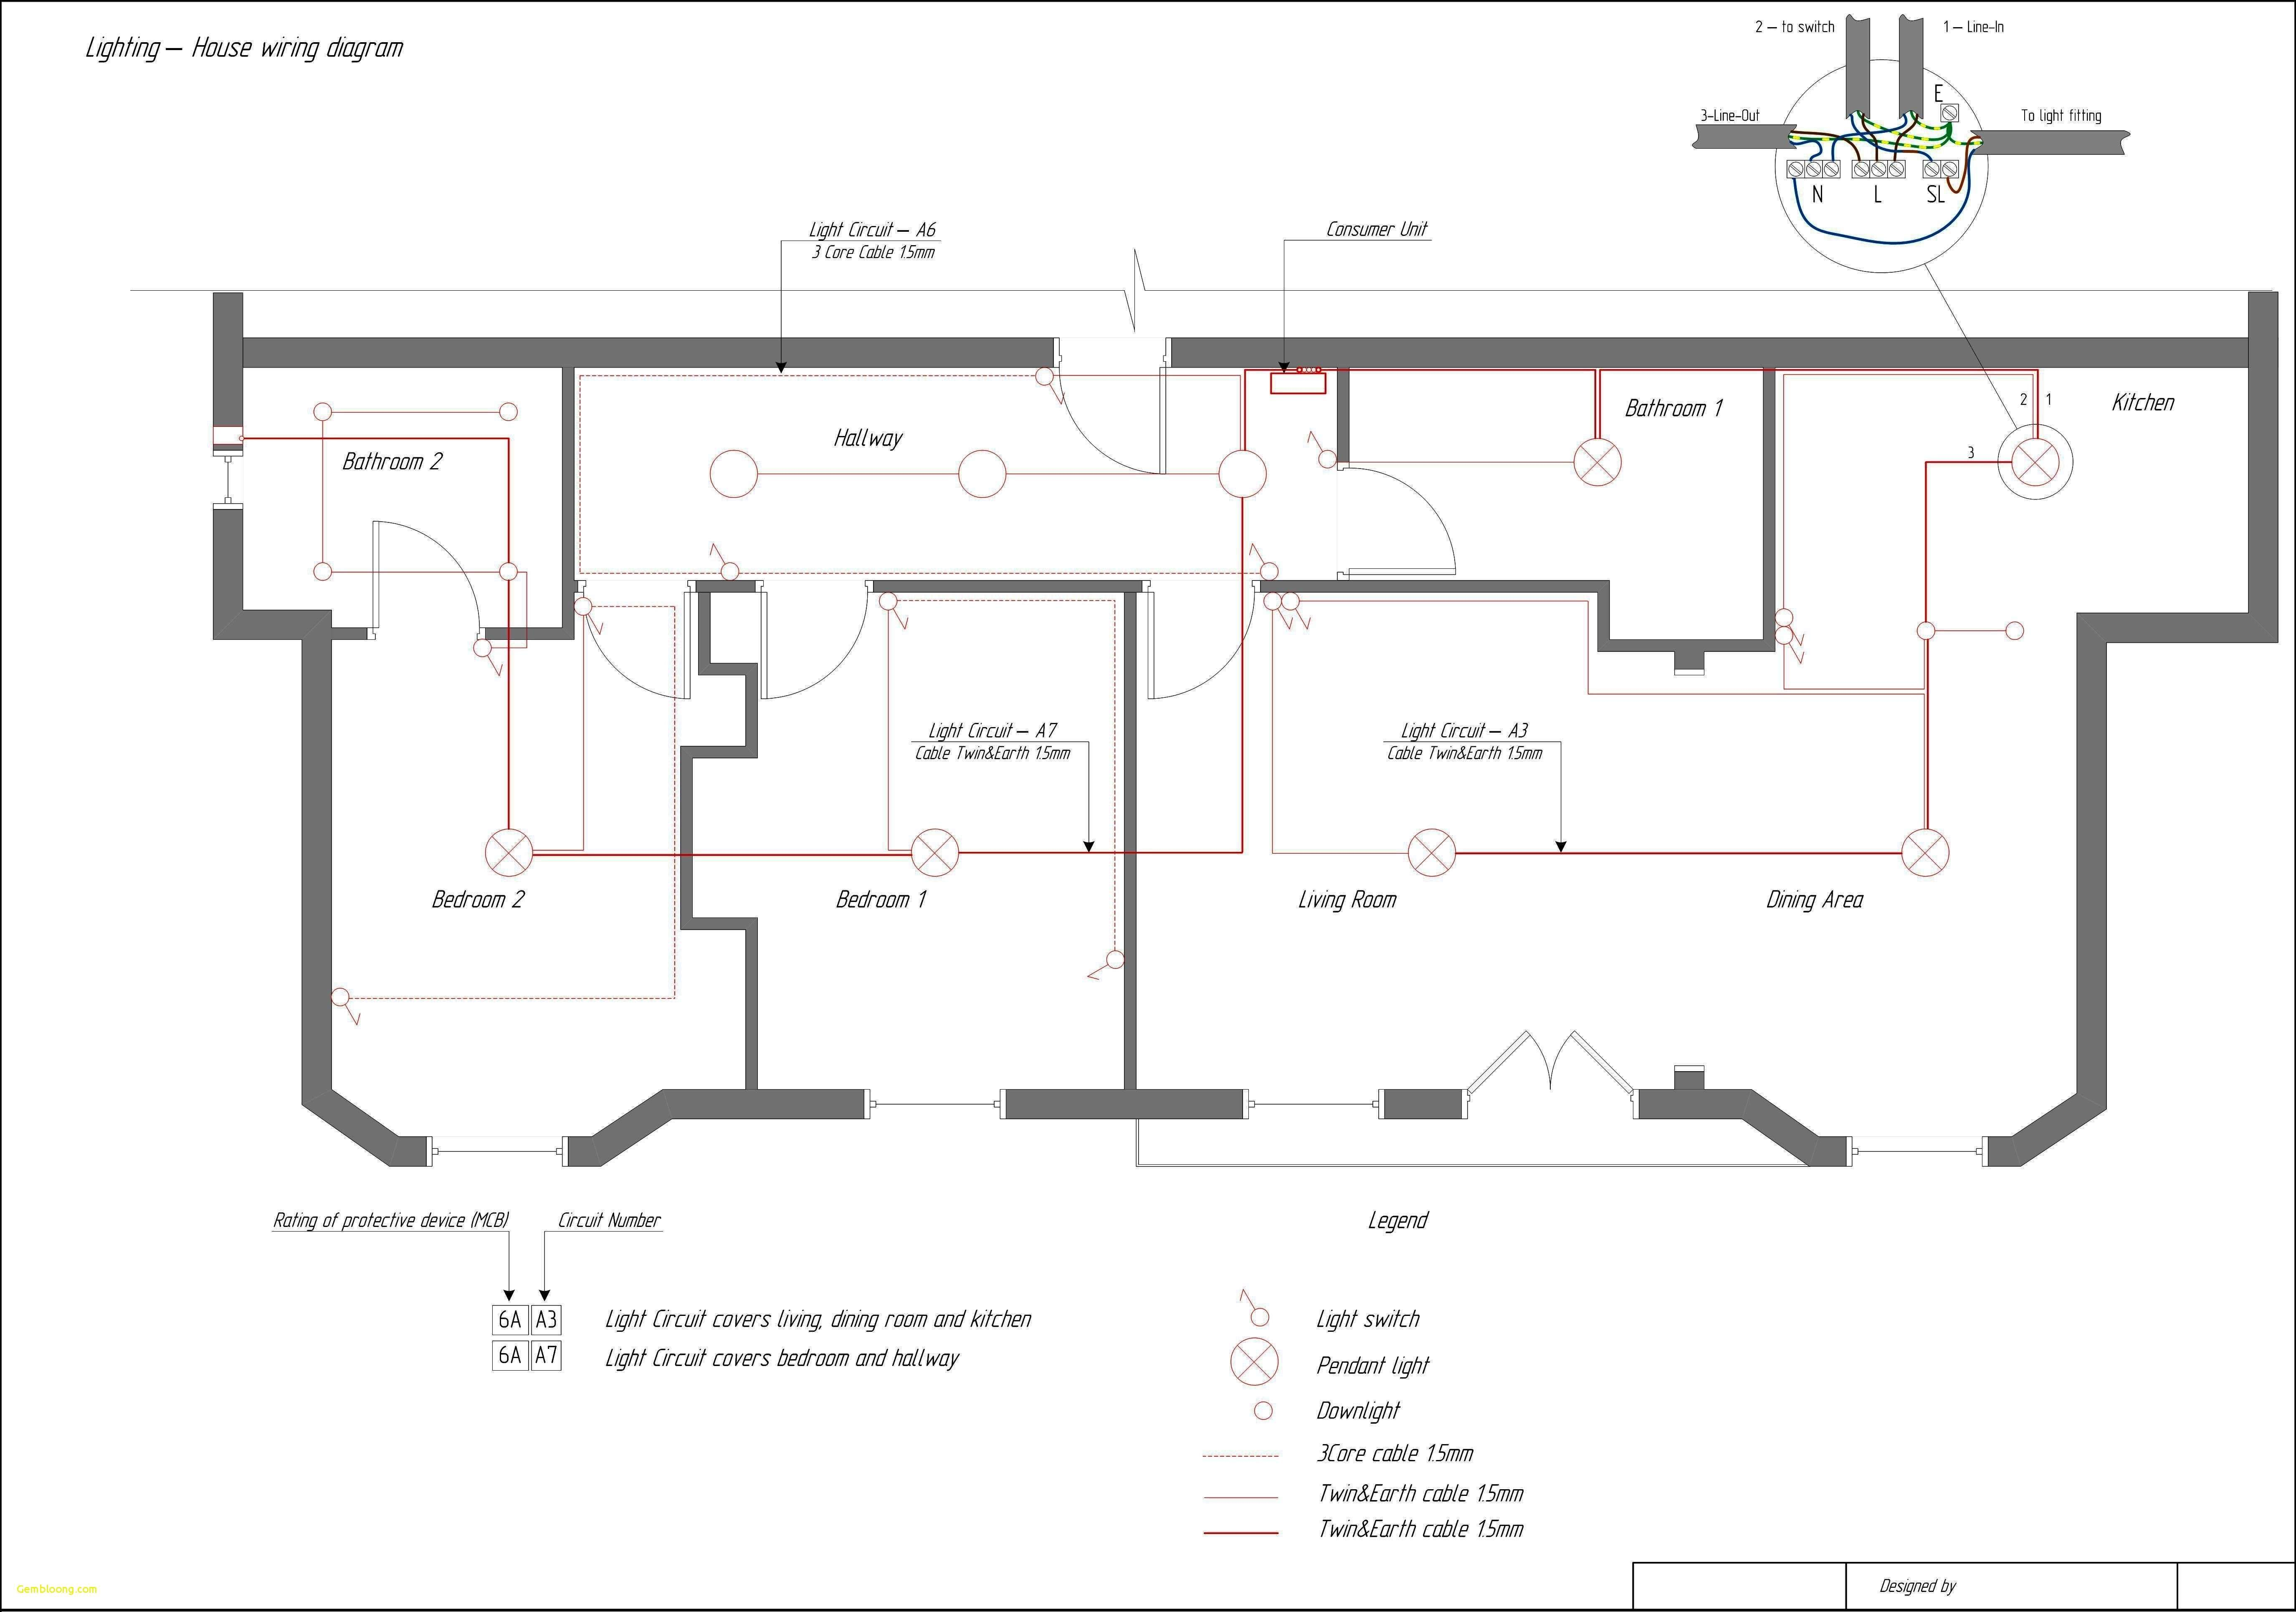 [SODI_2457]   Wiring Diagram Bathroom. Lovely Wiring Diagram Bathroom. Bathroom Fan Light Wiring  Diagram Mikulskilawo… | House wiring, Electrical circuit diagram, Domestic  wiring | Wiring Diagram For A 3 Bedroom House |  | Pinterest